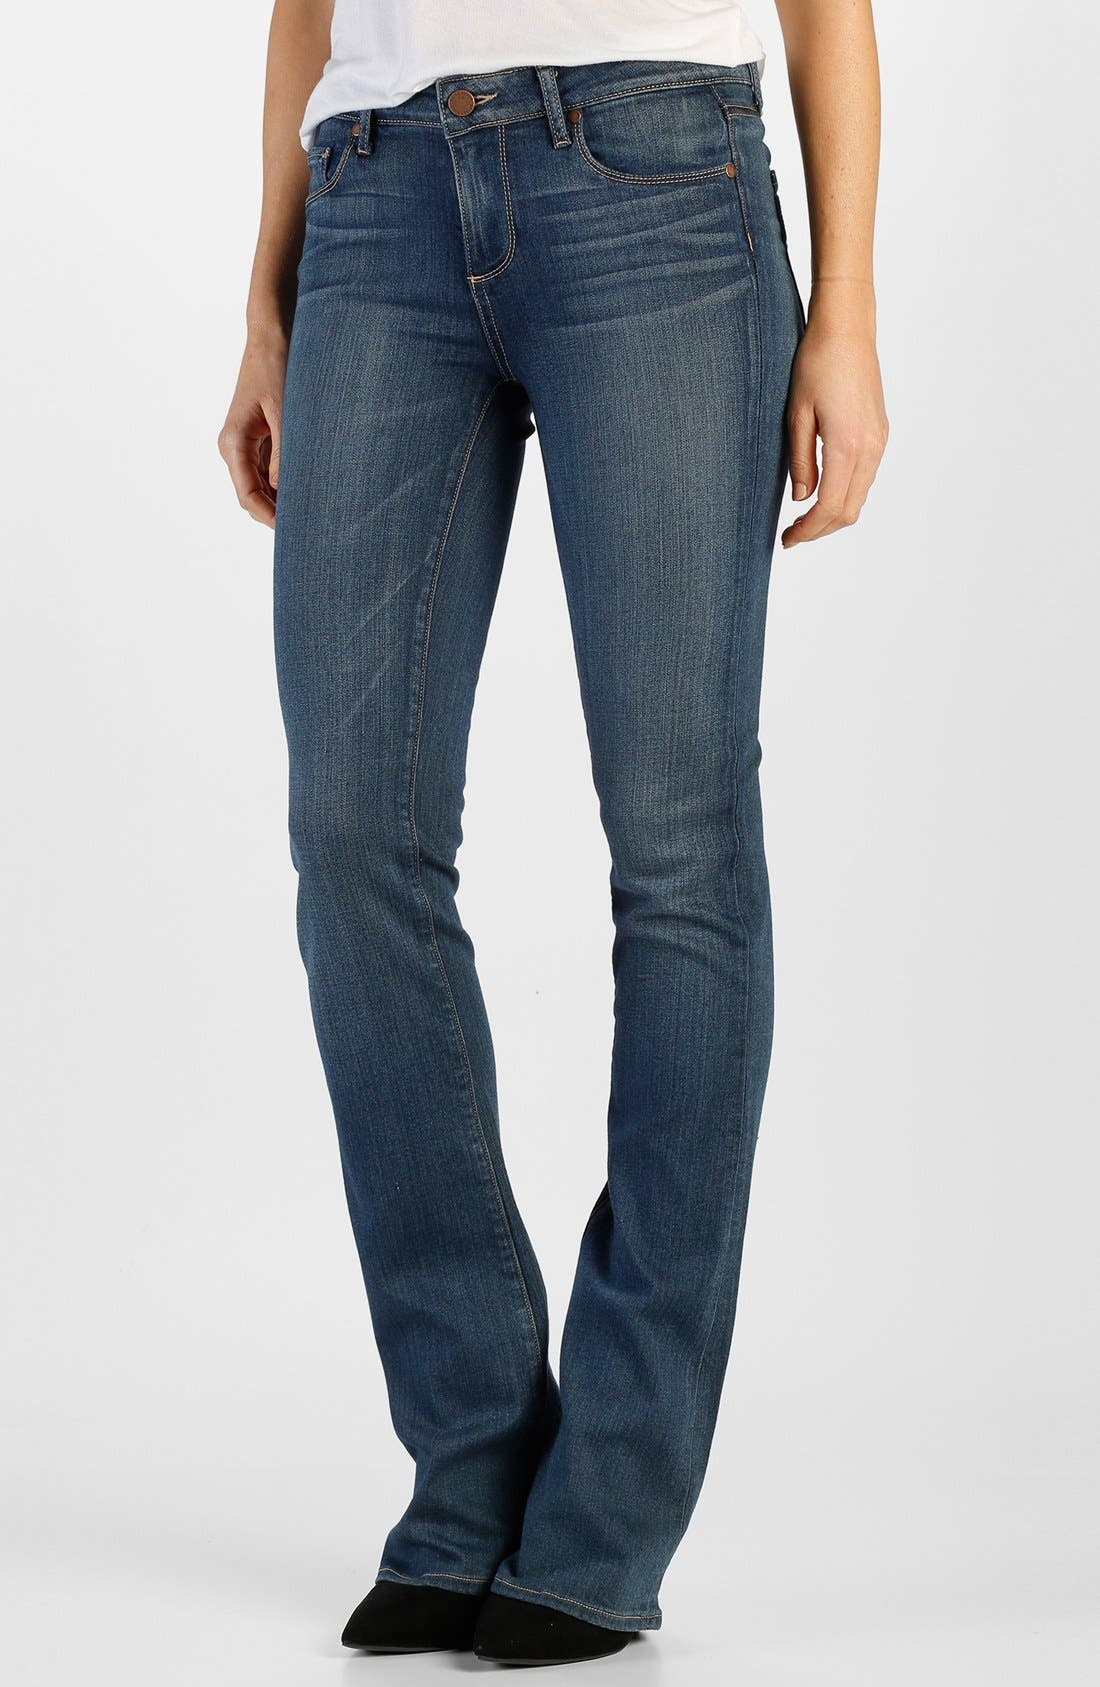 Main Image - Paige Denim 'Manhattan' Bootcut Jeans (Lex)